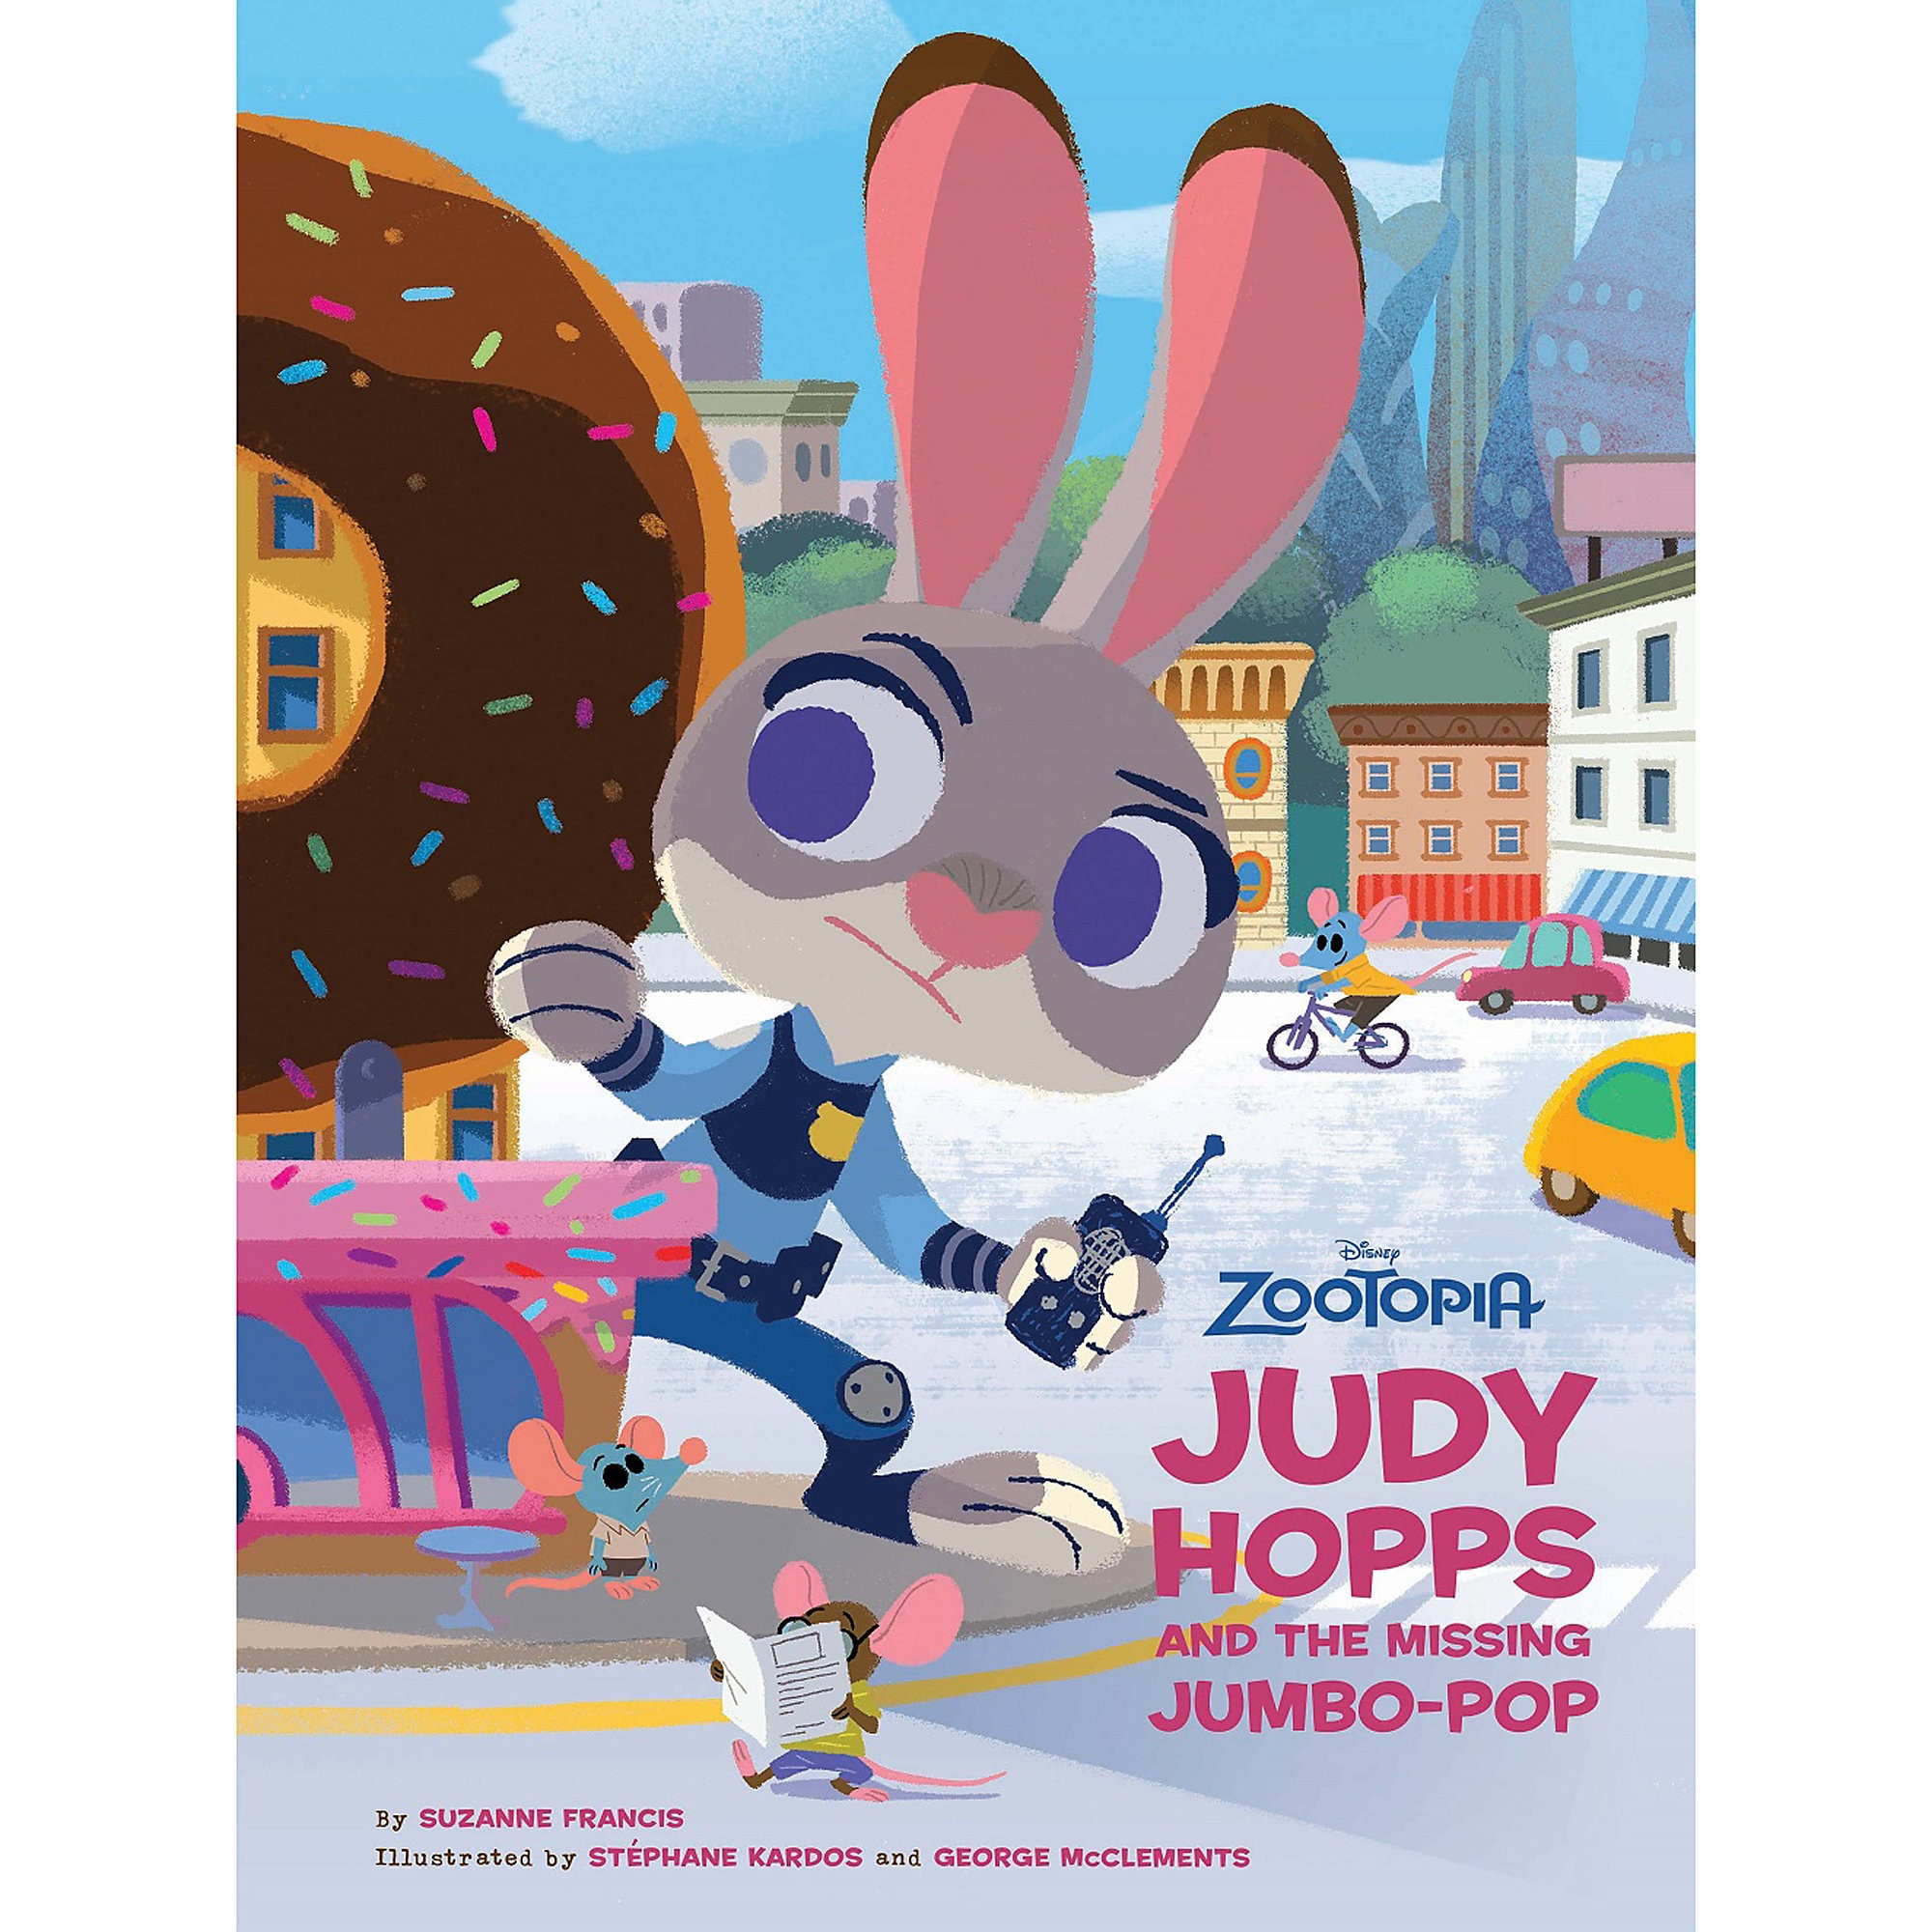 Zootopia: Judy Hopps and the Missing Jumbo-Pop Book